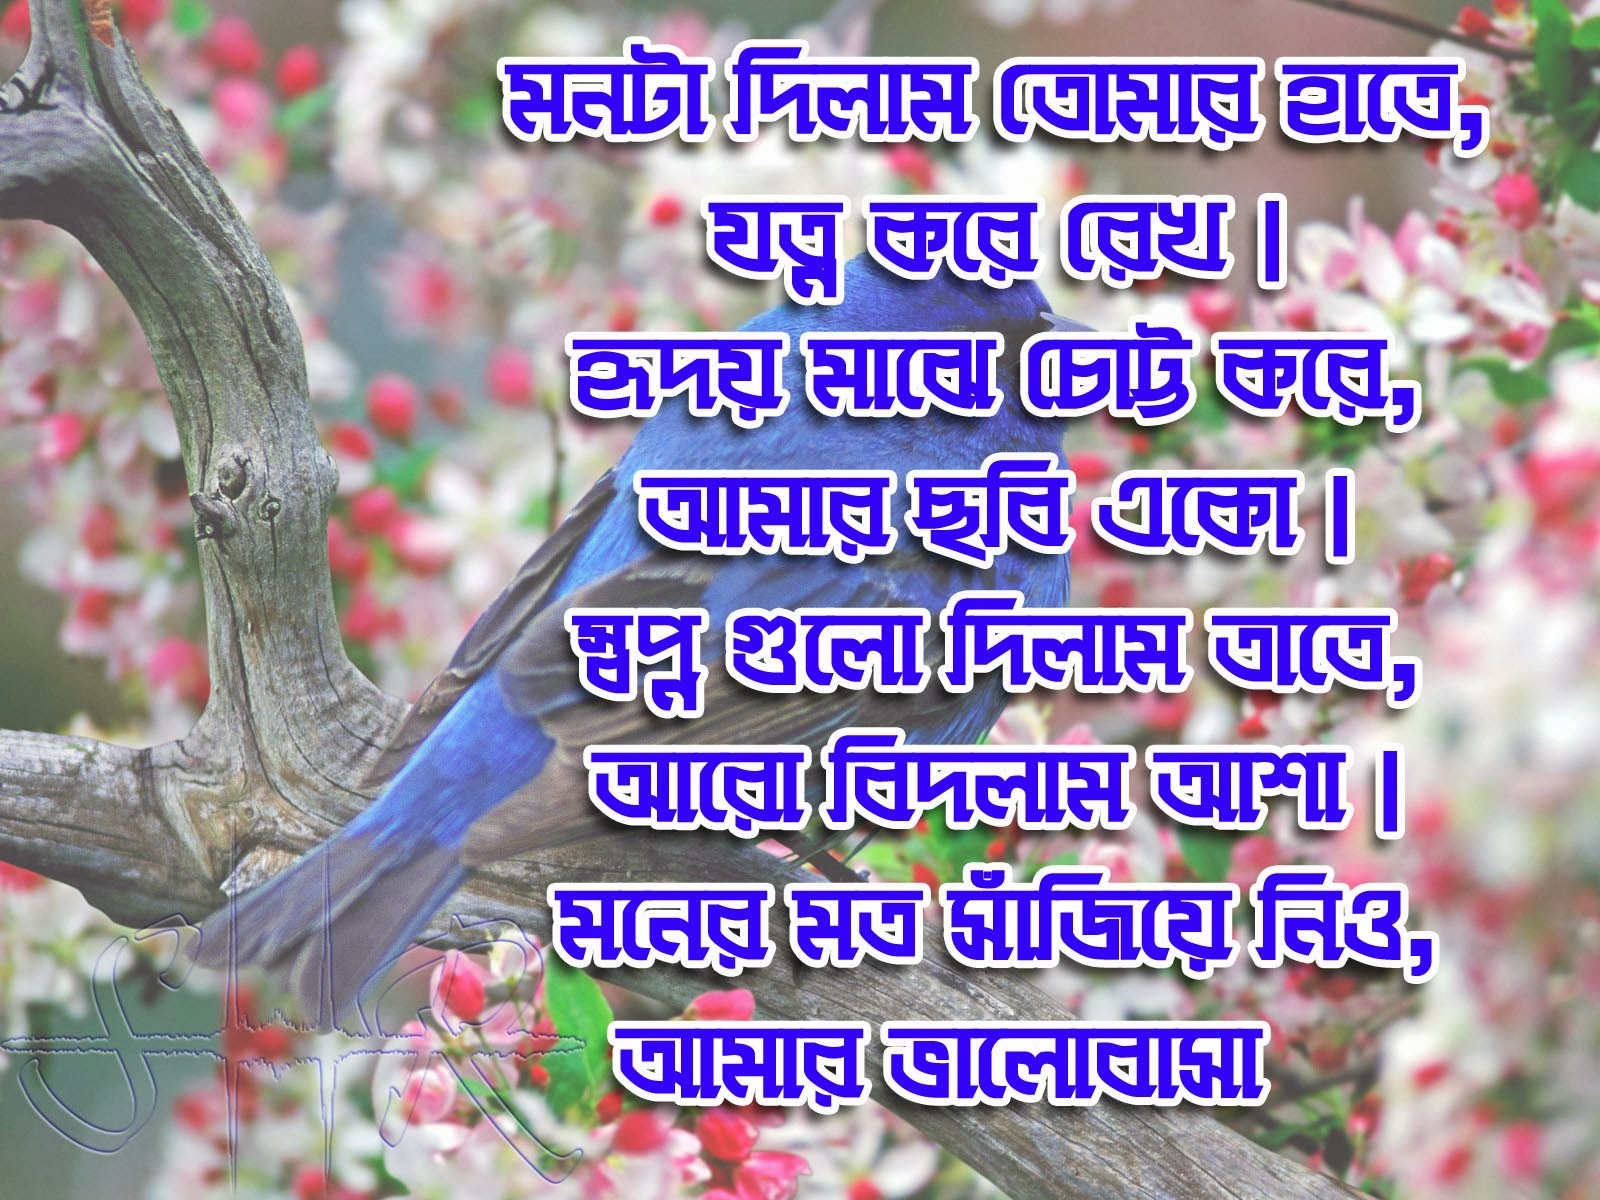 Bangla Sms Picture Bangla Health Tips